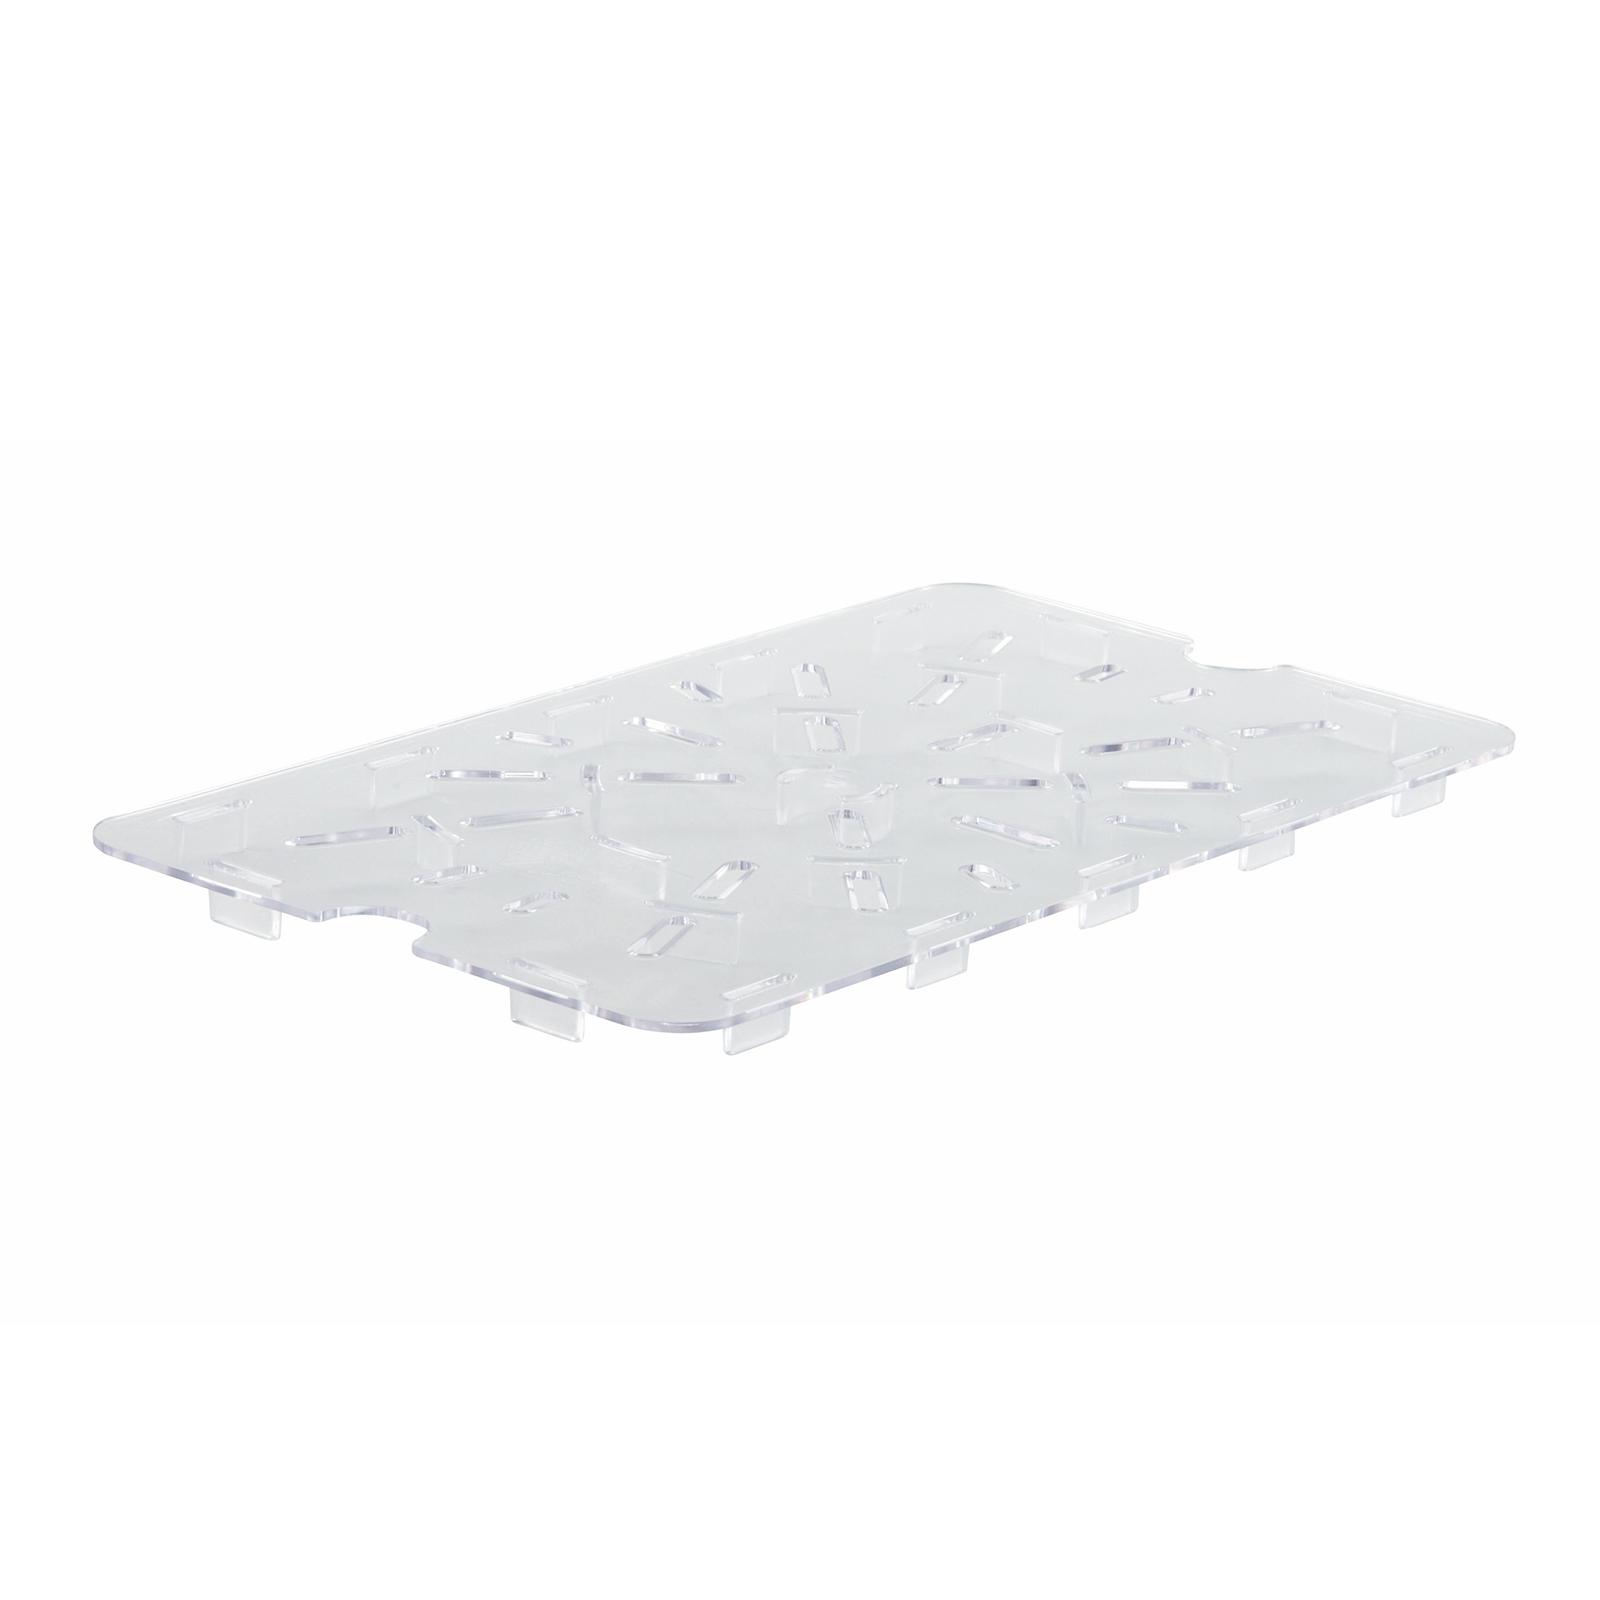 2700-809 Winco PFSH-DS food pan drain tray